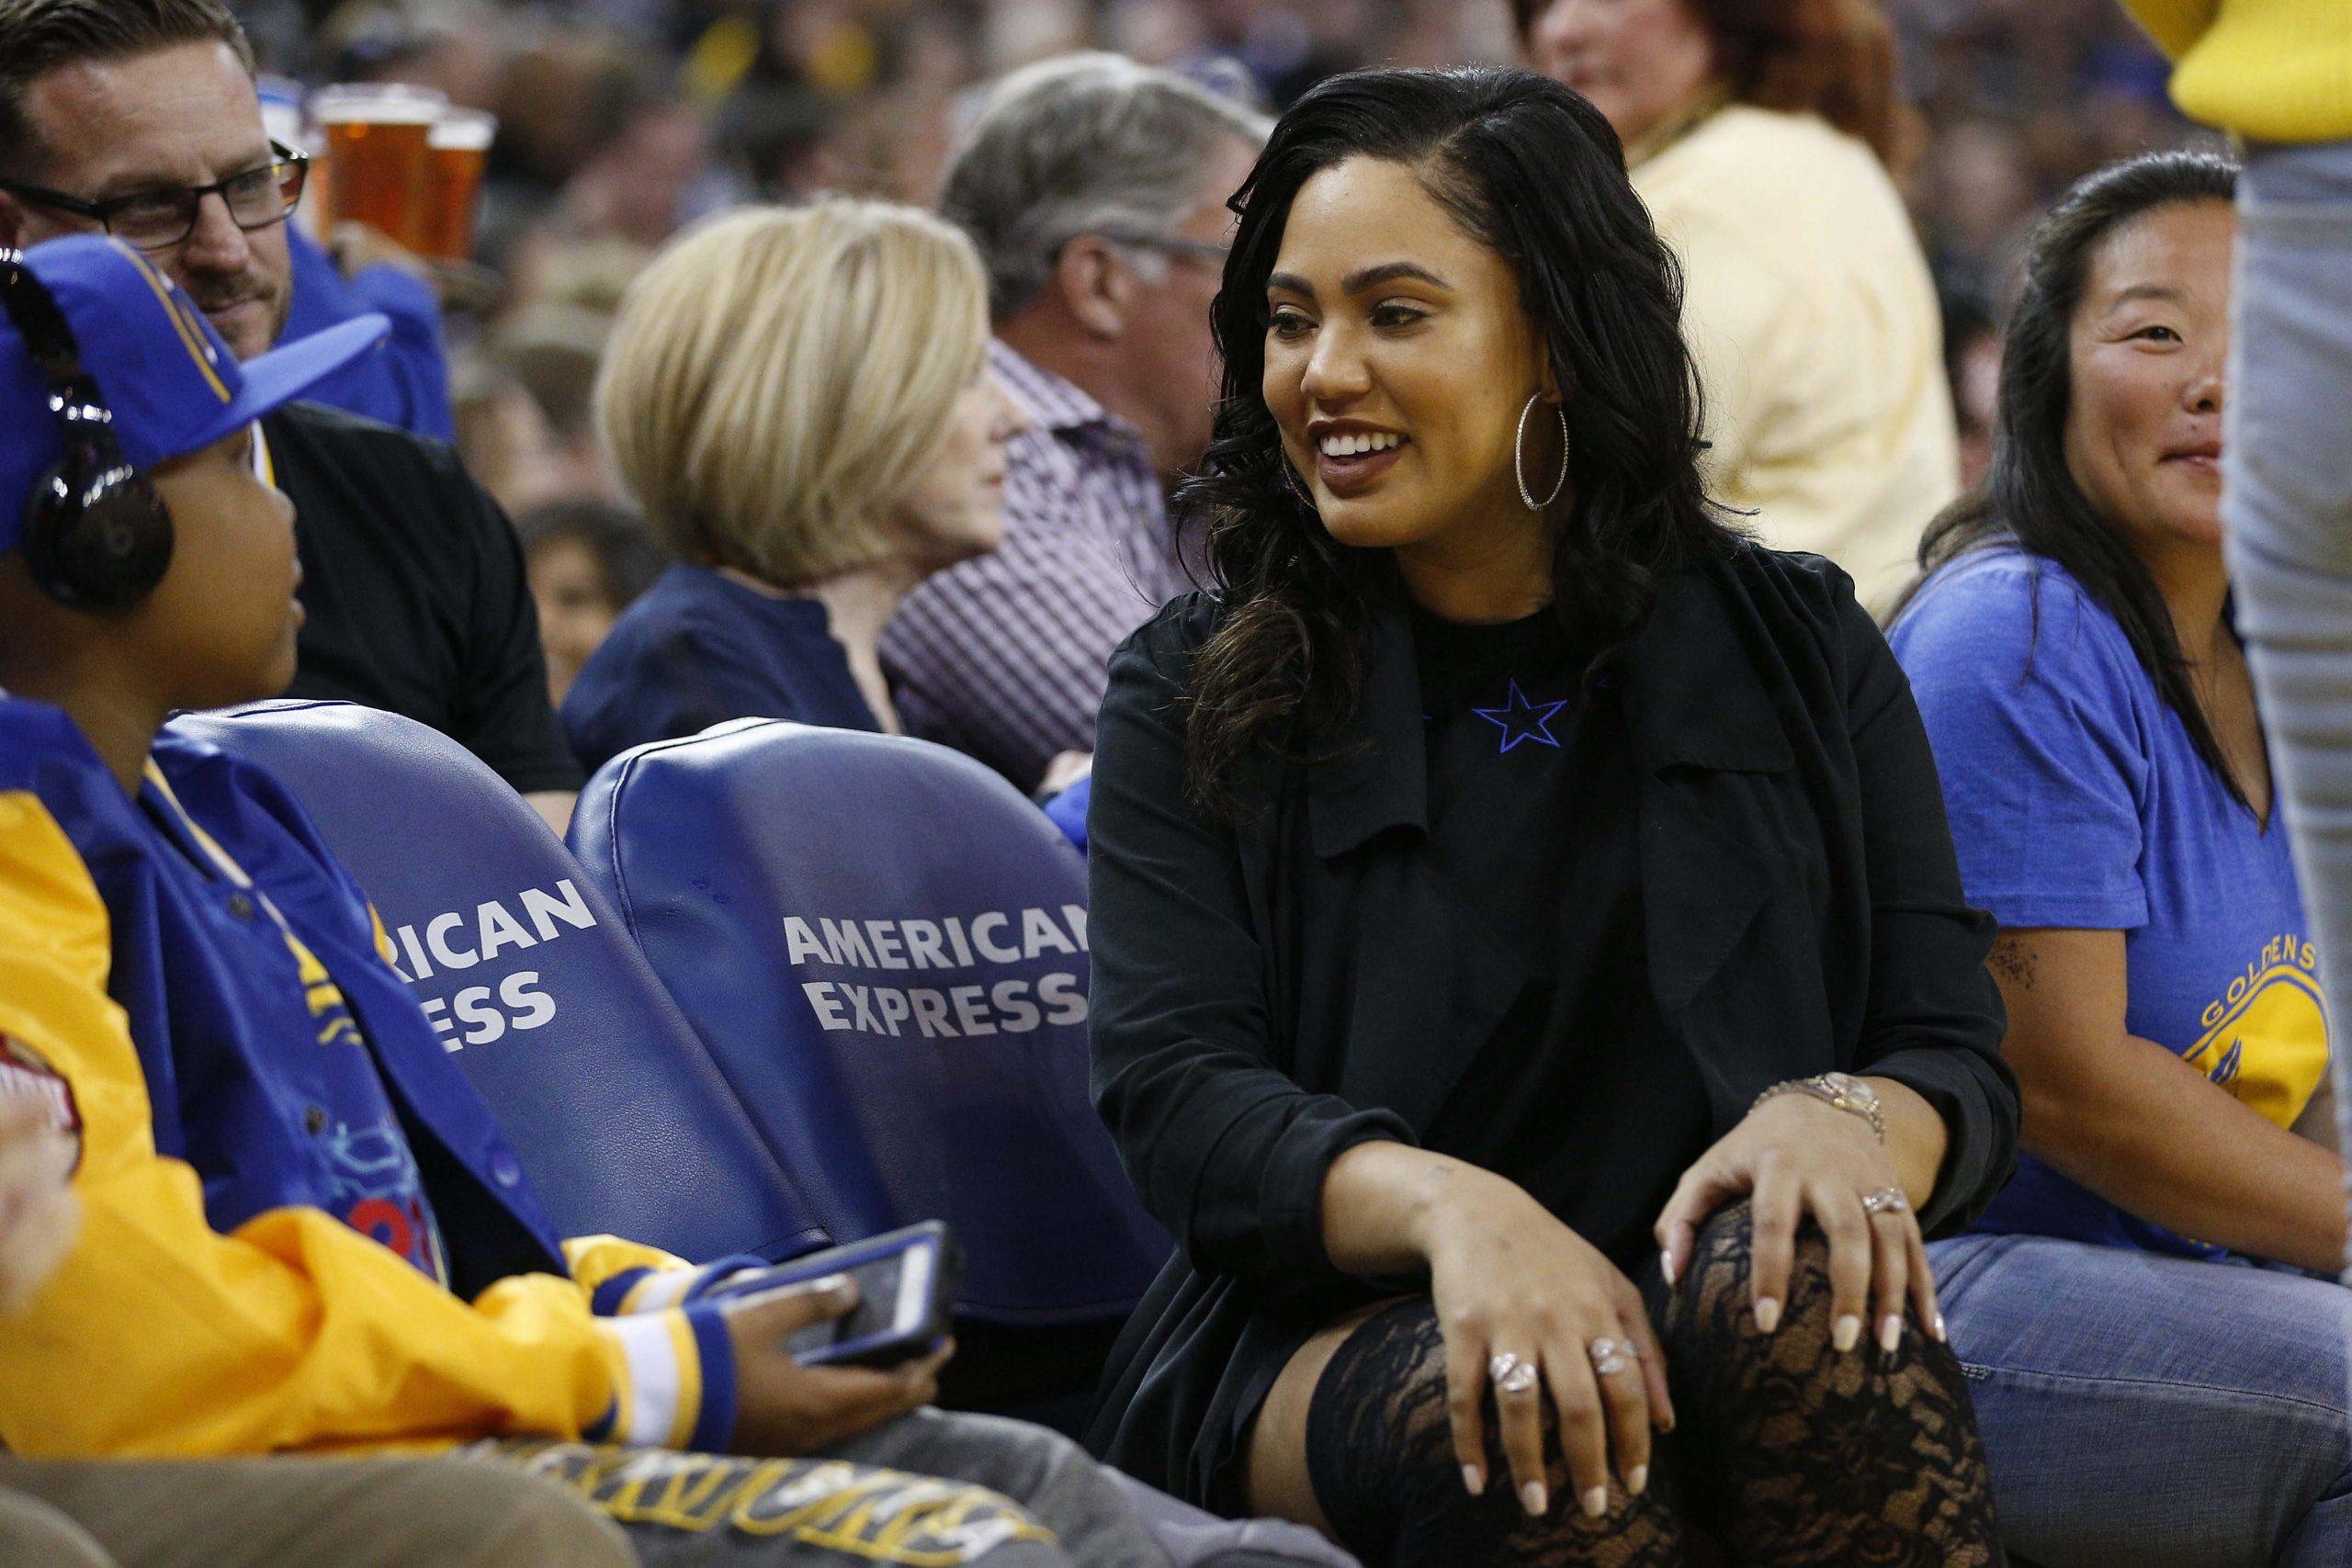 Ayesha Curry hints at Warriors tanking this season after Steph's injury